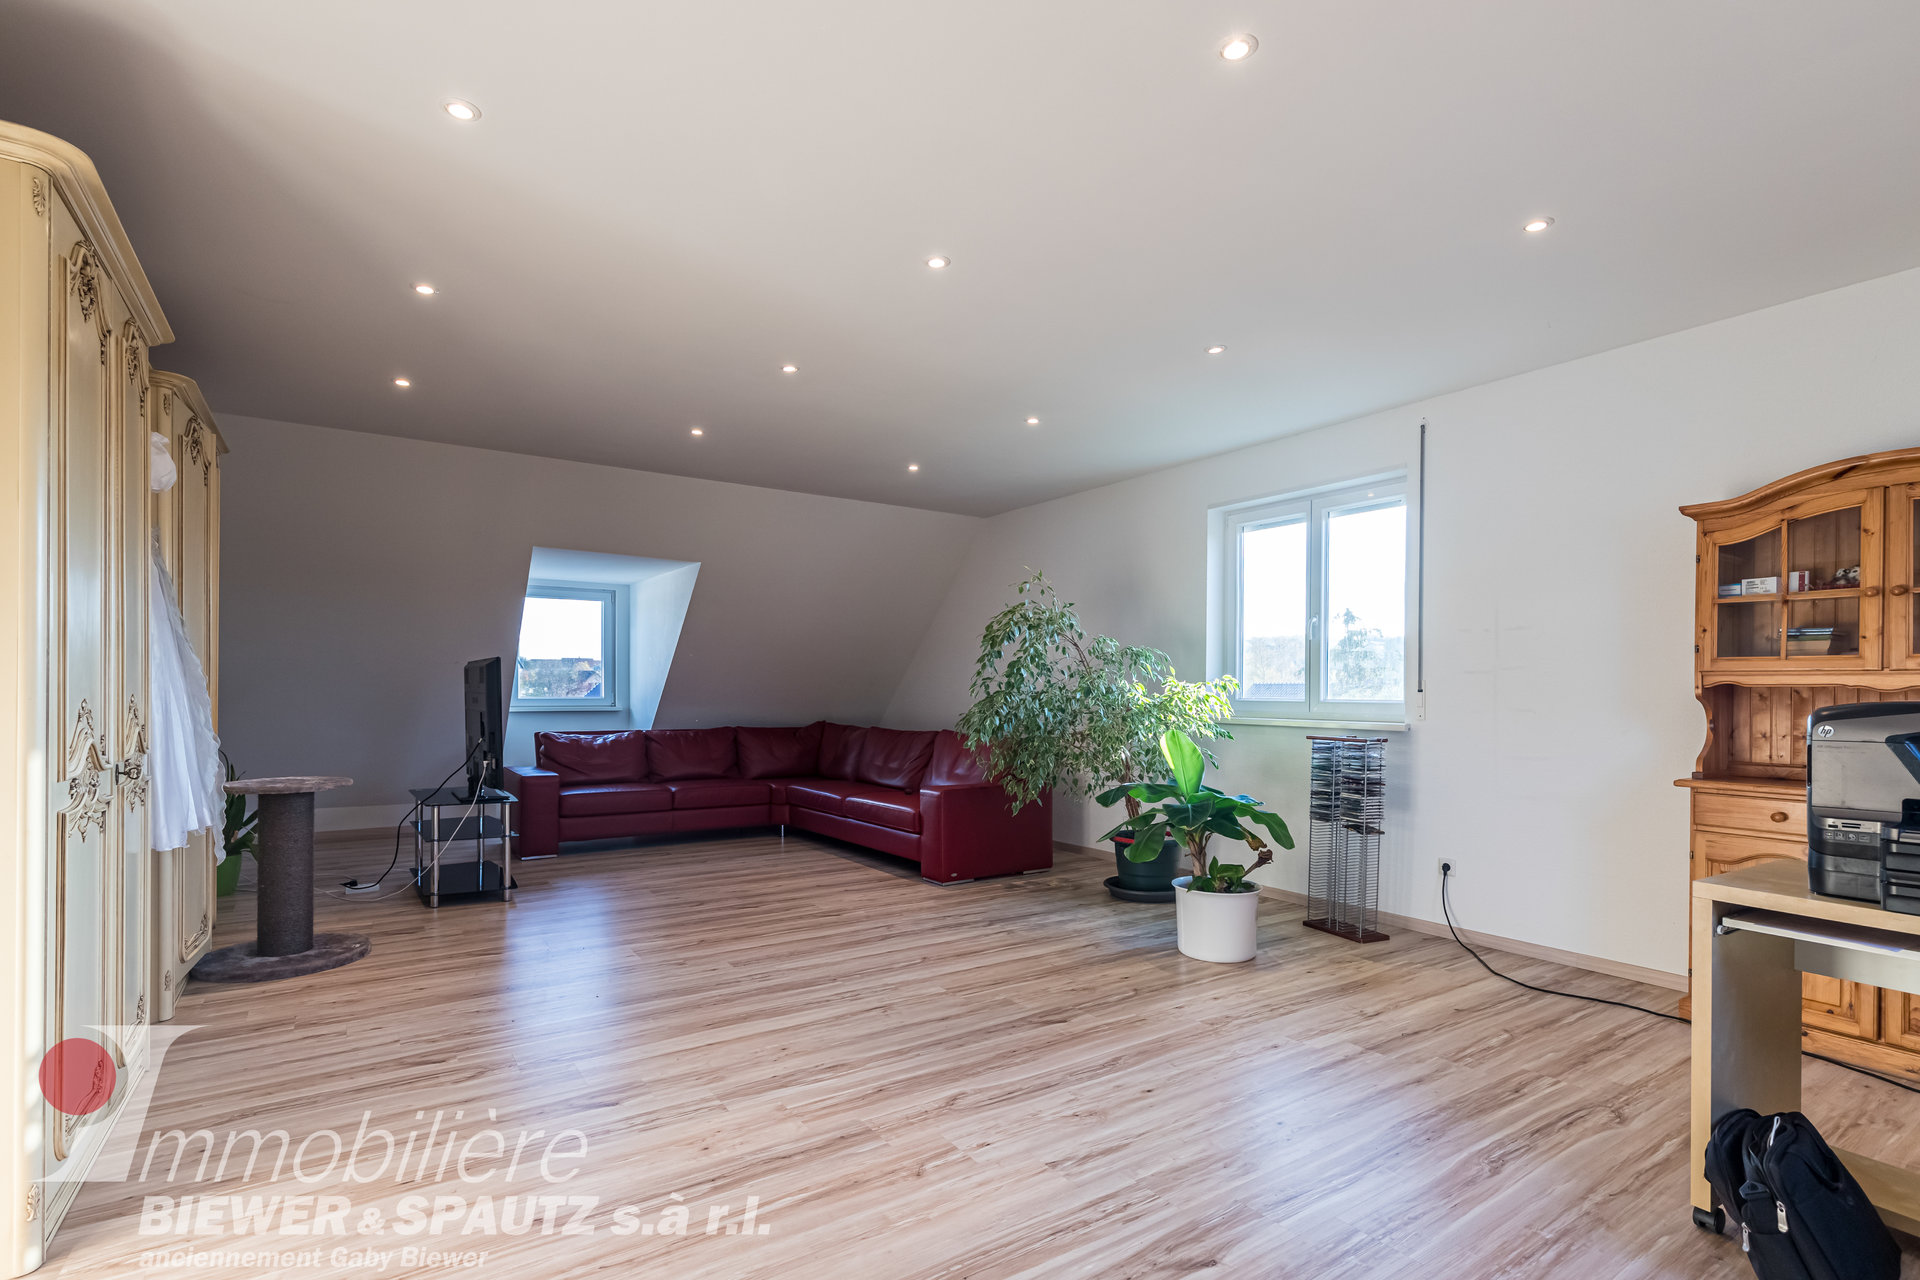 VENDU - appartement-triplex avec 4 chambres à coucher à Berbourg